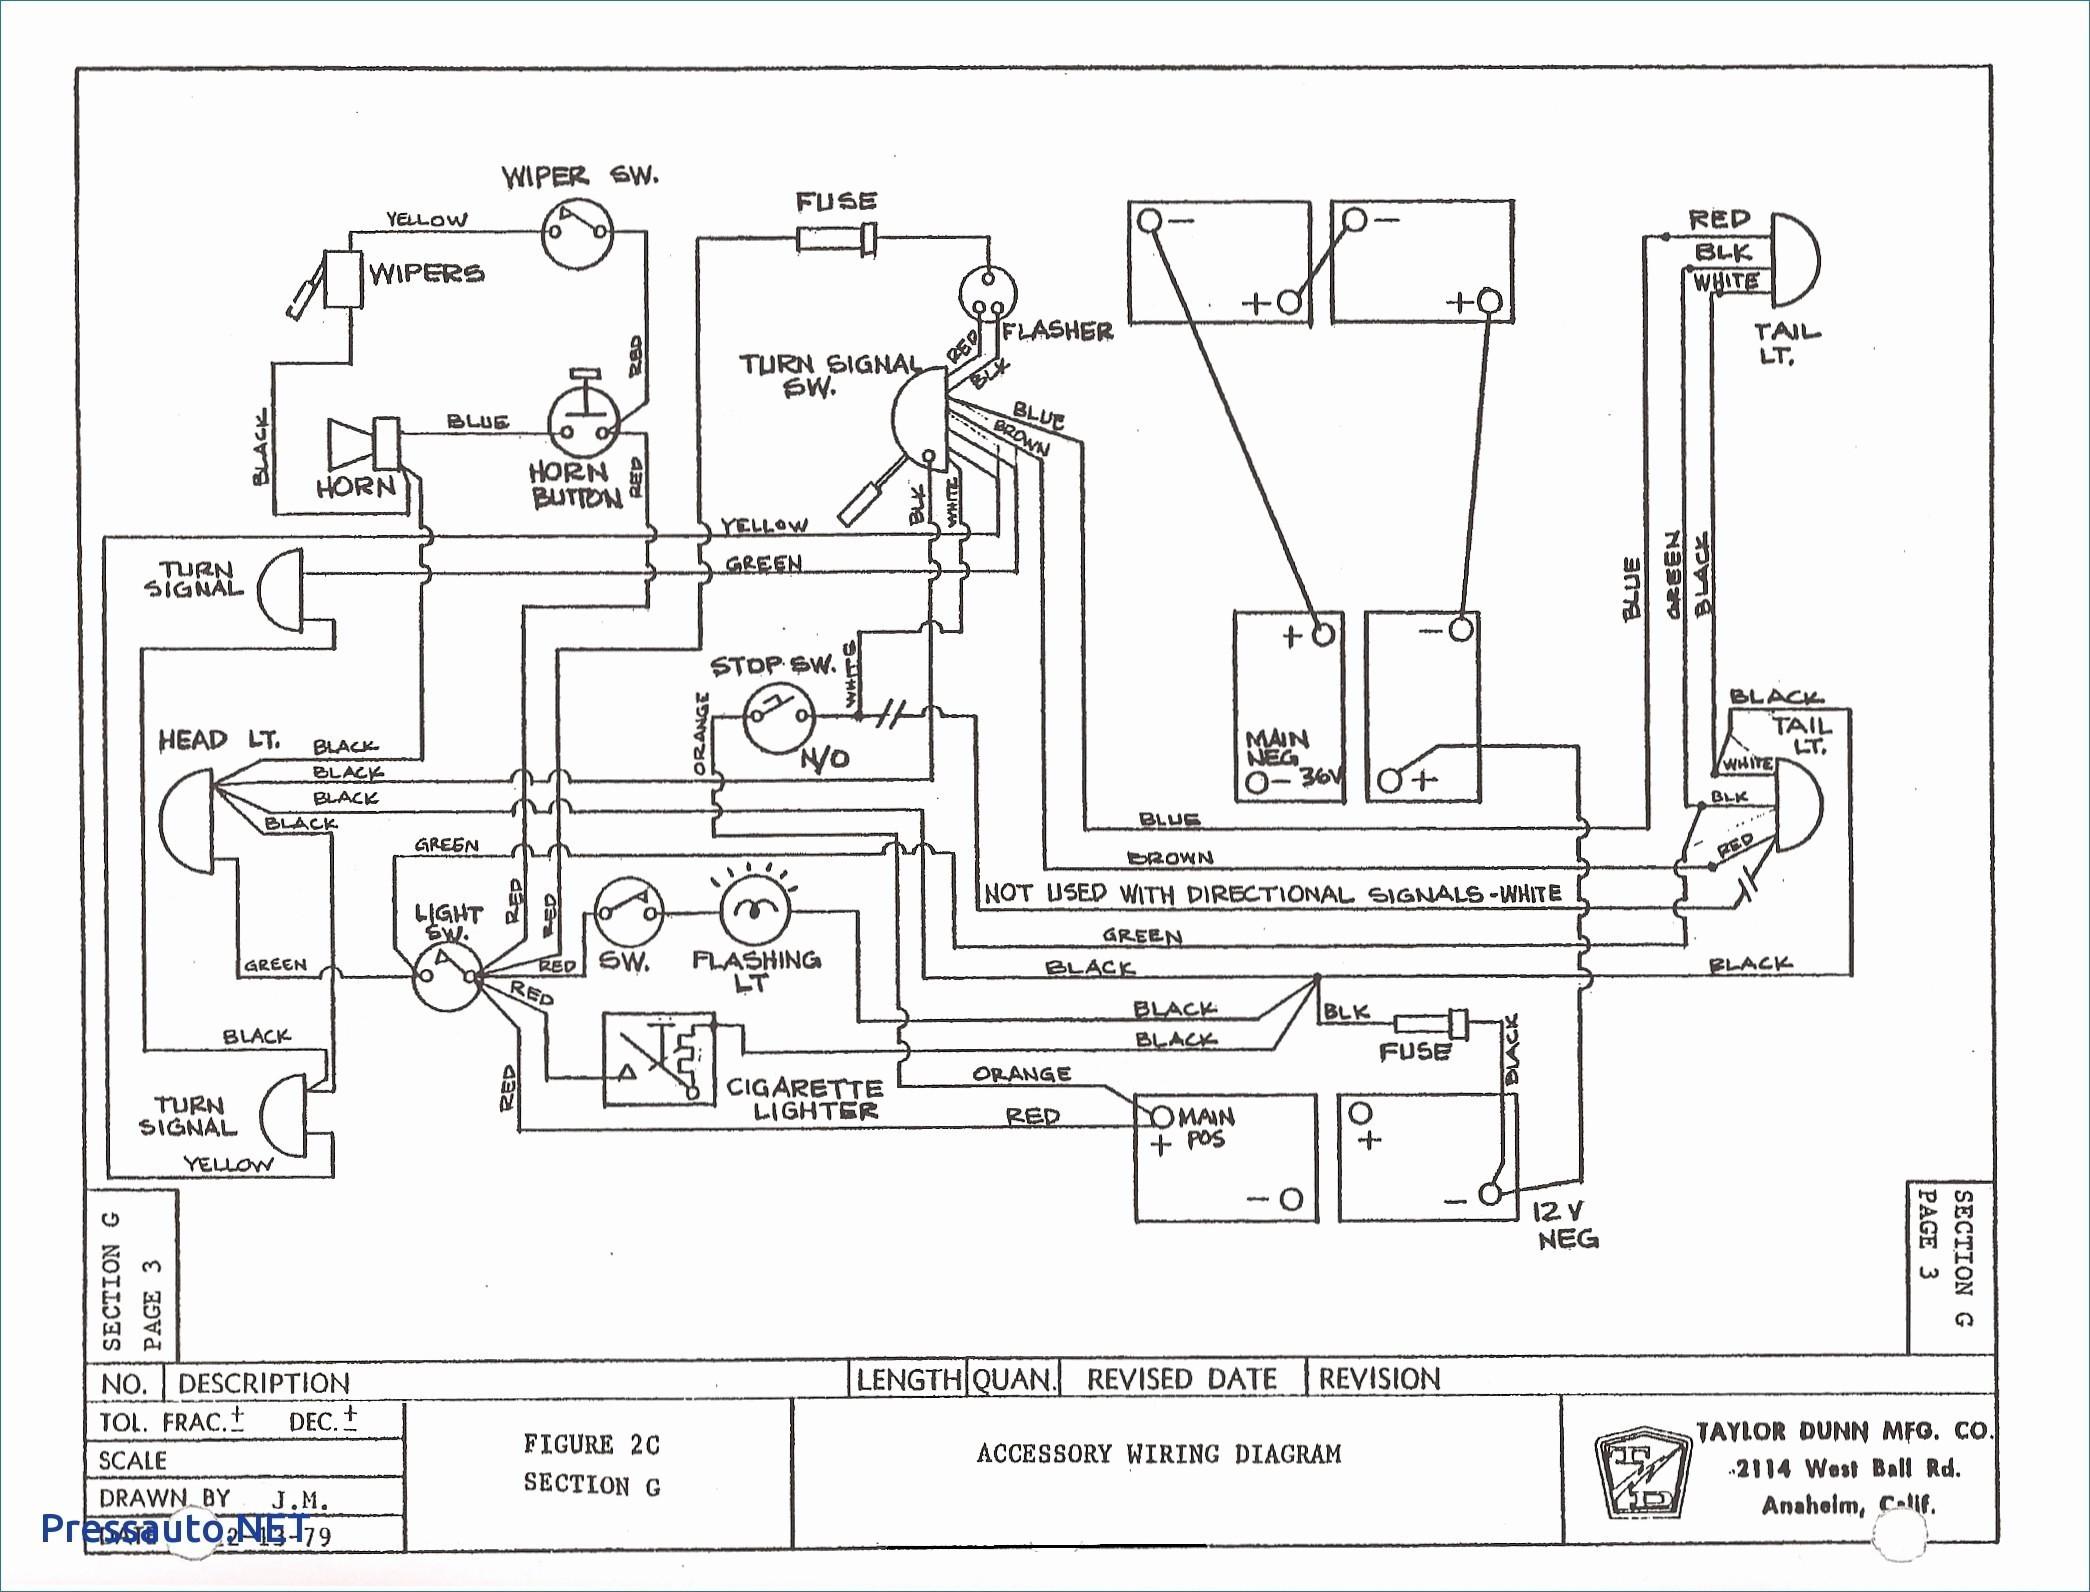 DIAGRAM] Gas Par Car Wiring Diagrams FULL Version HD Quality Wiring Diagrams  - STRUCTUREDSETTLEME.NIBERMA.FRstructuredsettleme.niberma.fr